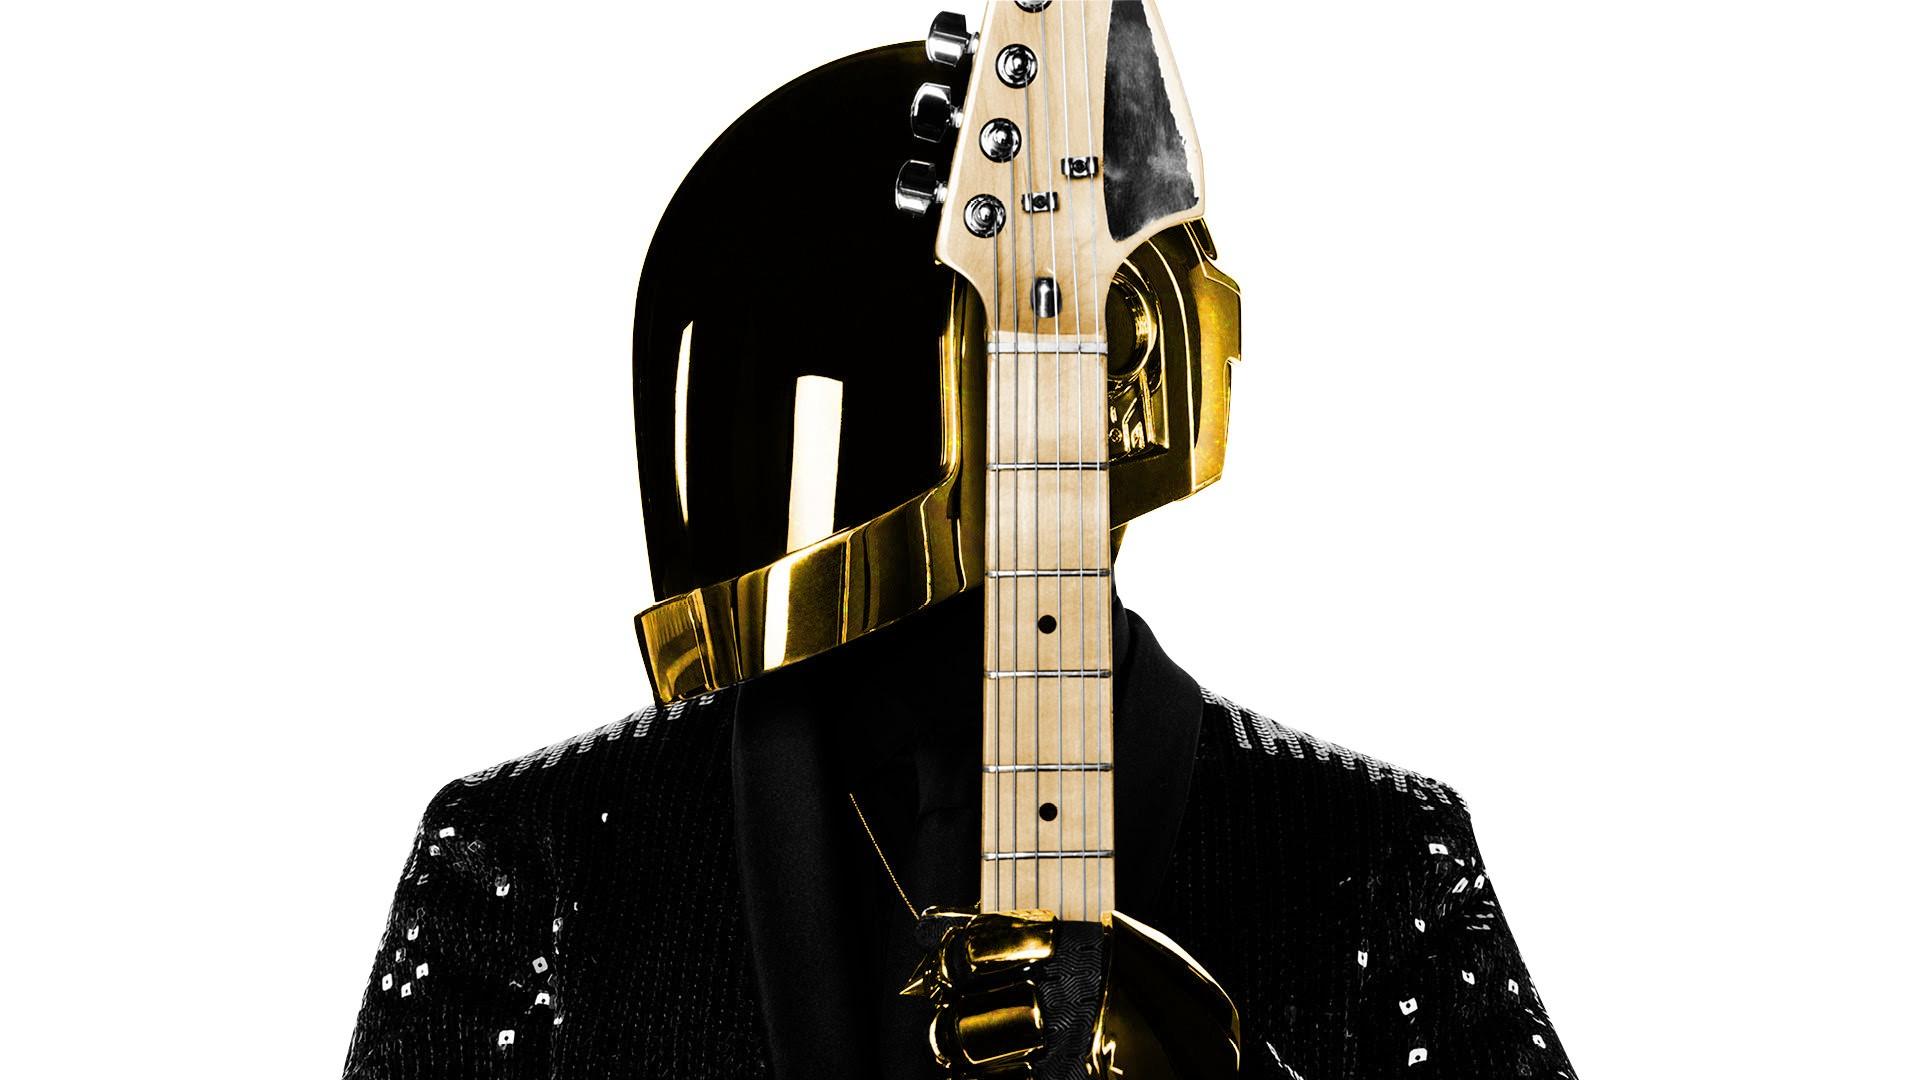 Daft Punk Guitar White wallpaper   1920x1080   78684   WallpaperUP